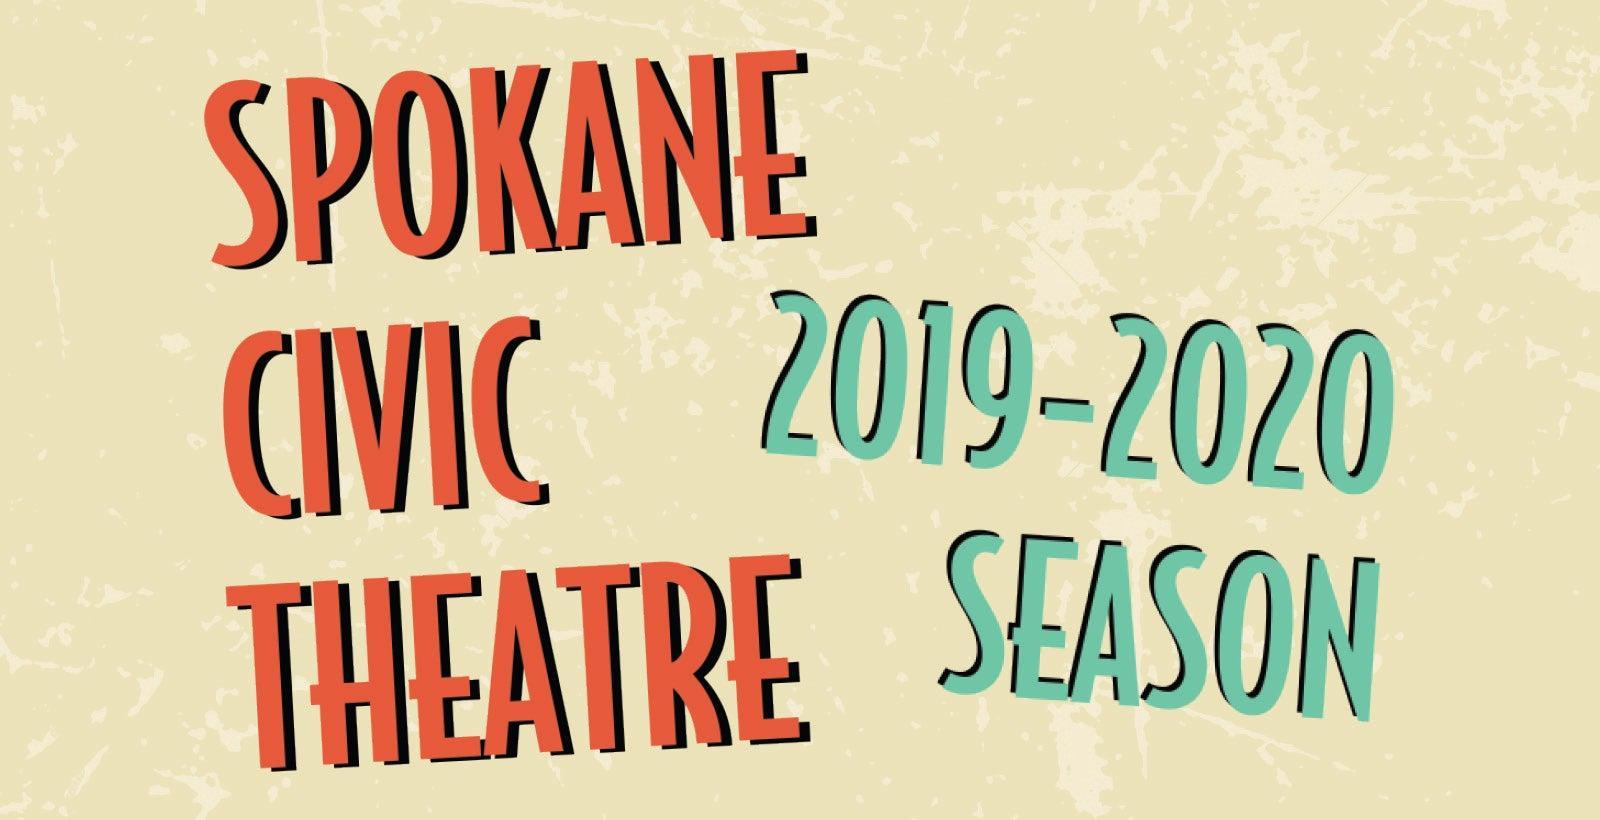 Spokane Civic Theater Main Stage Season Tickets 2019 - 2020